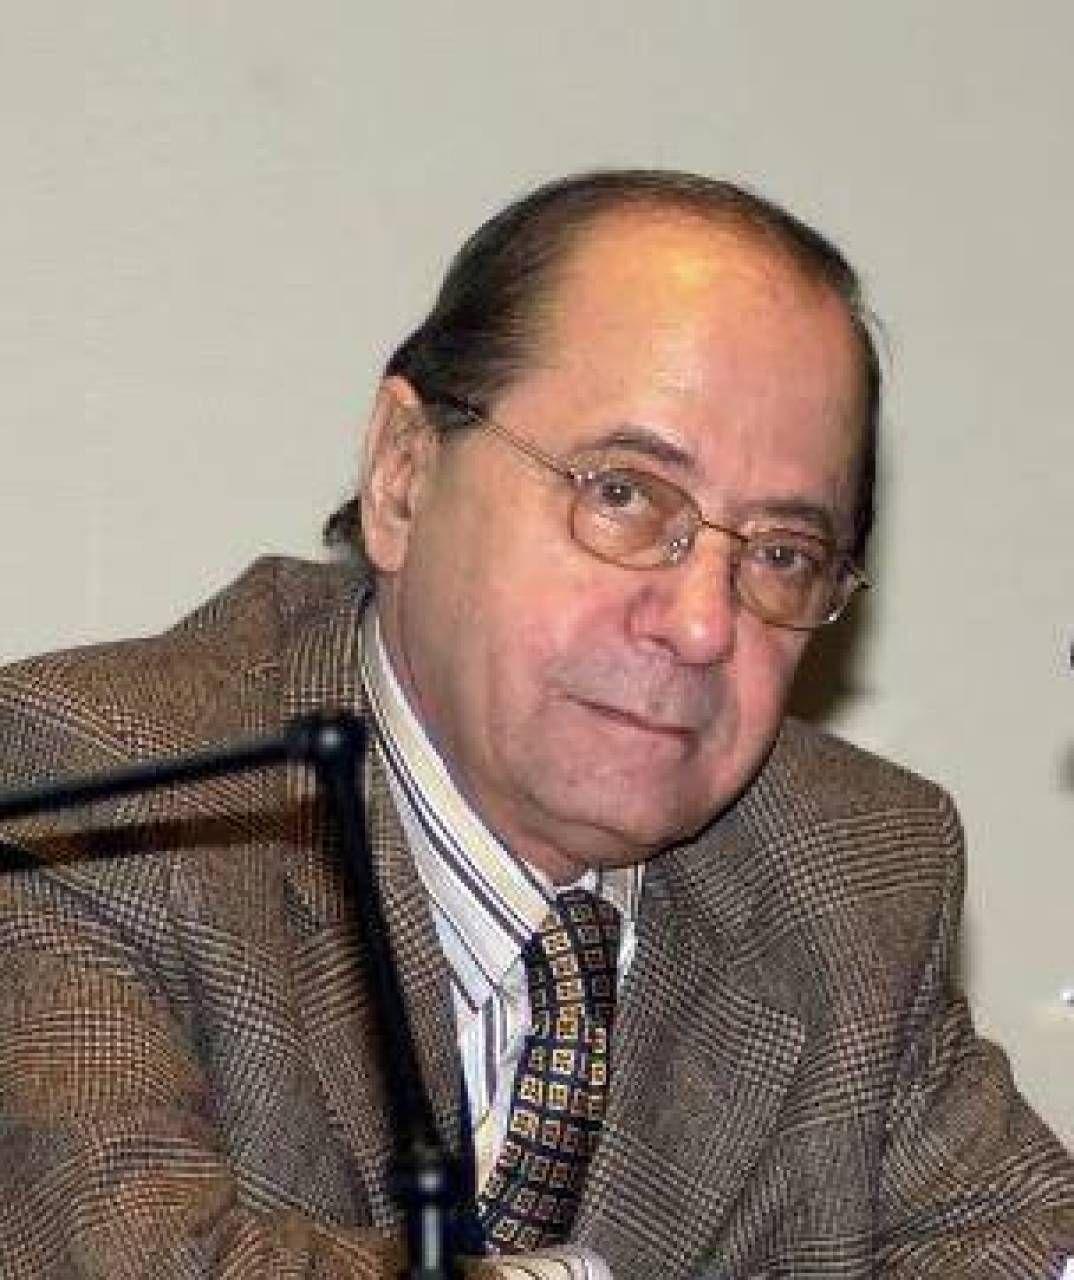 Giuseppe Turani, è scomparso ieri  a 79 anni. Era nato a Voghera,  in provincia di Pavia